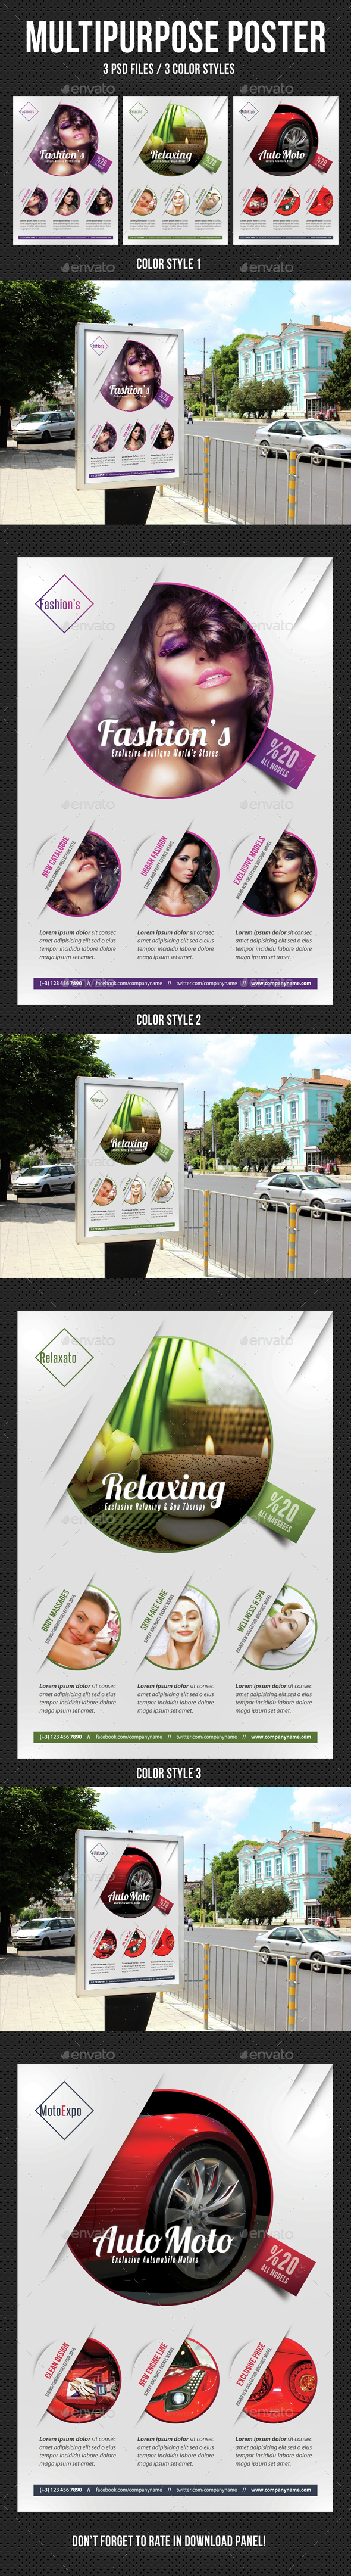 Multipurpose Flexible Poster 02 - Signage Print Templates